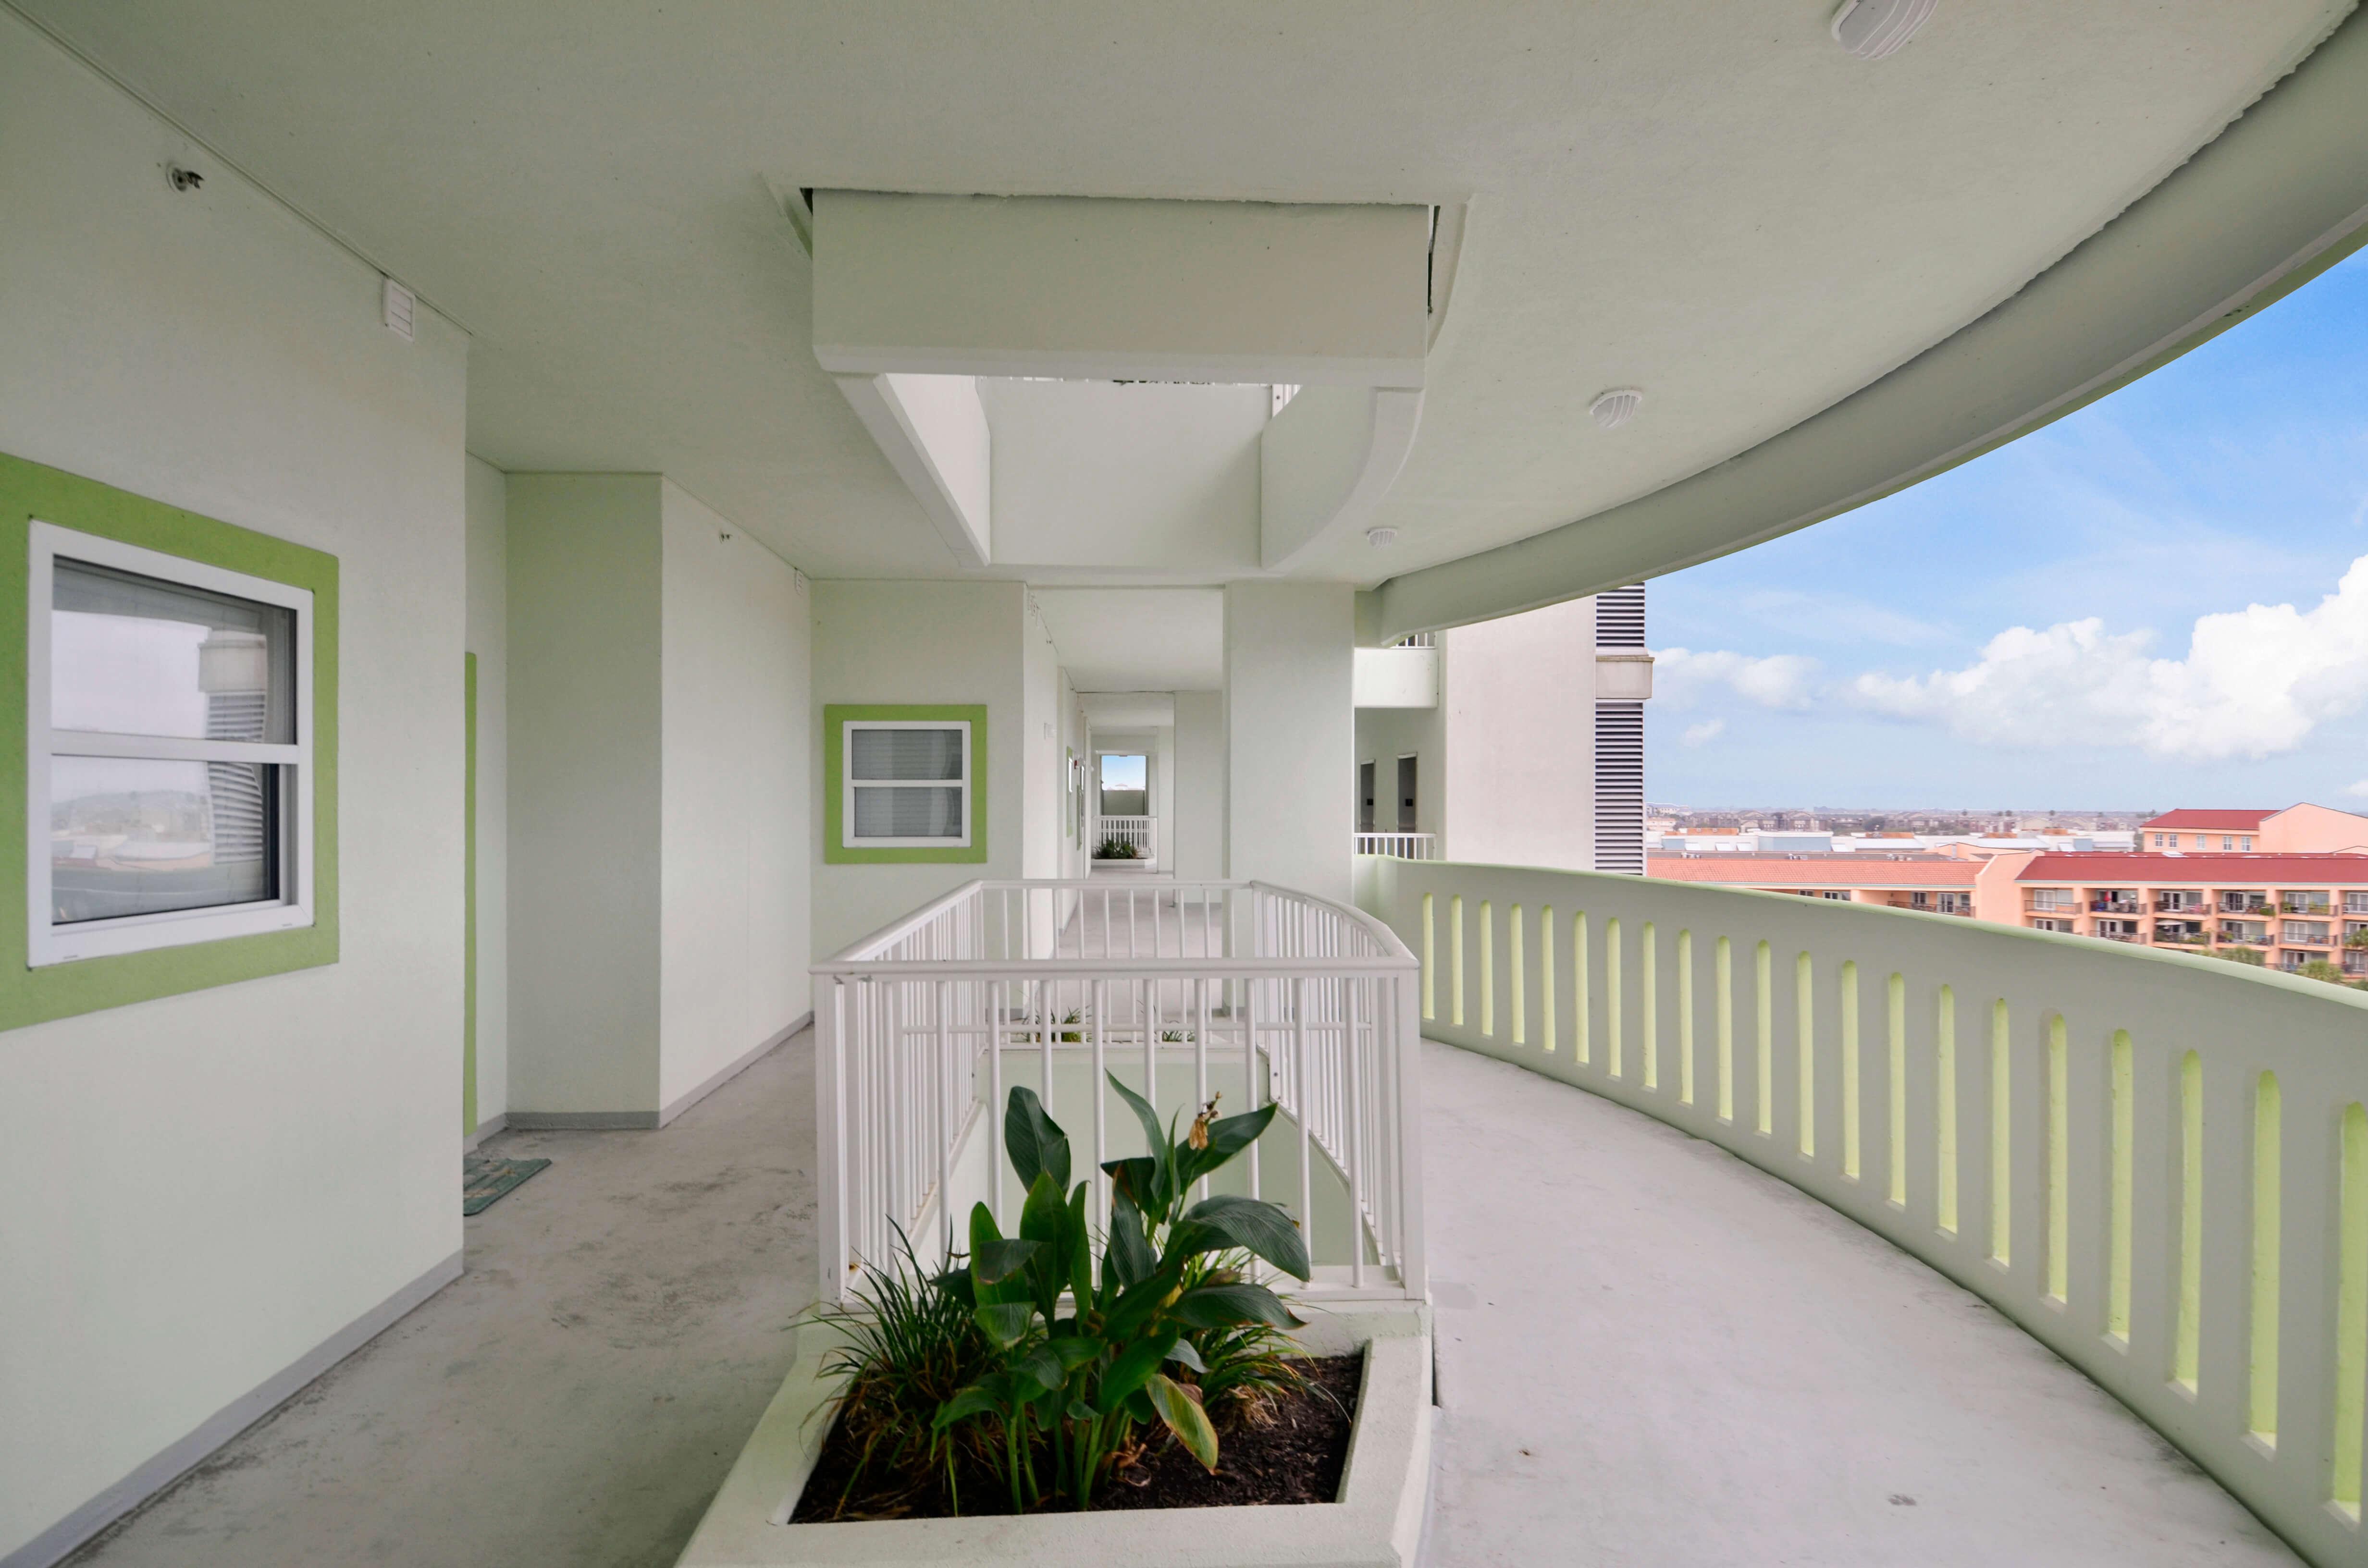 Backside Corridors of Ocean Grove Condominium